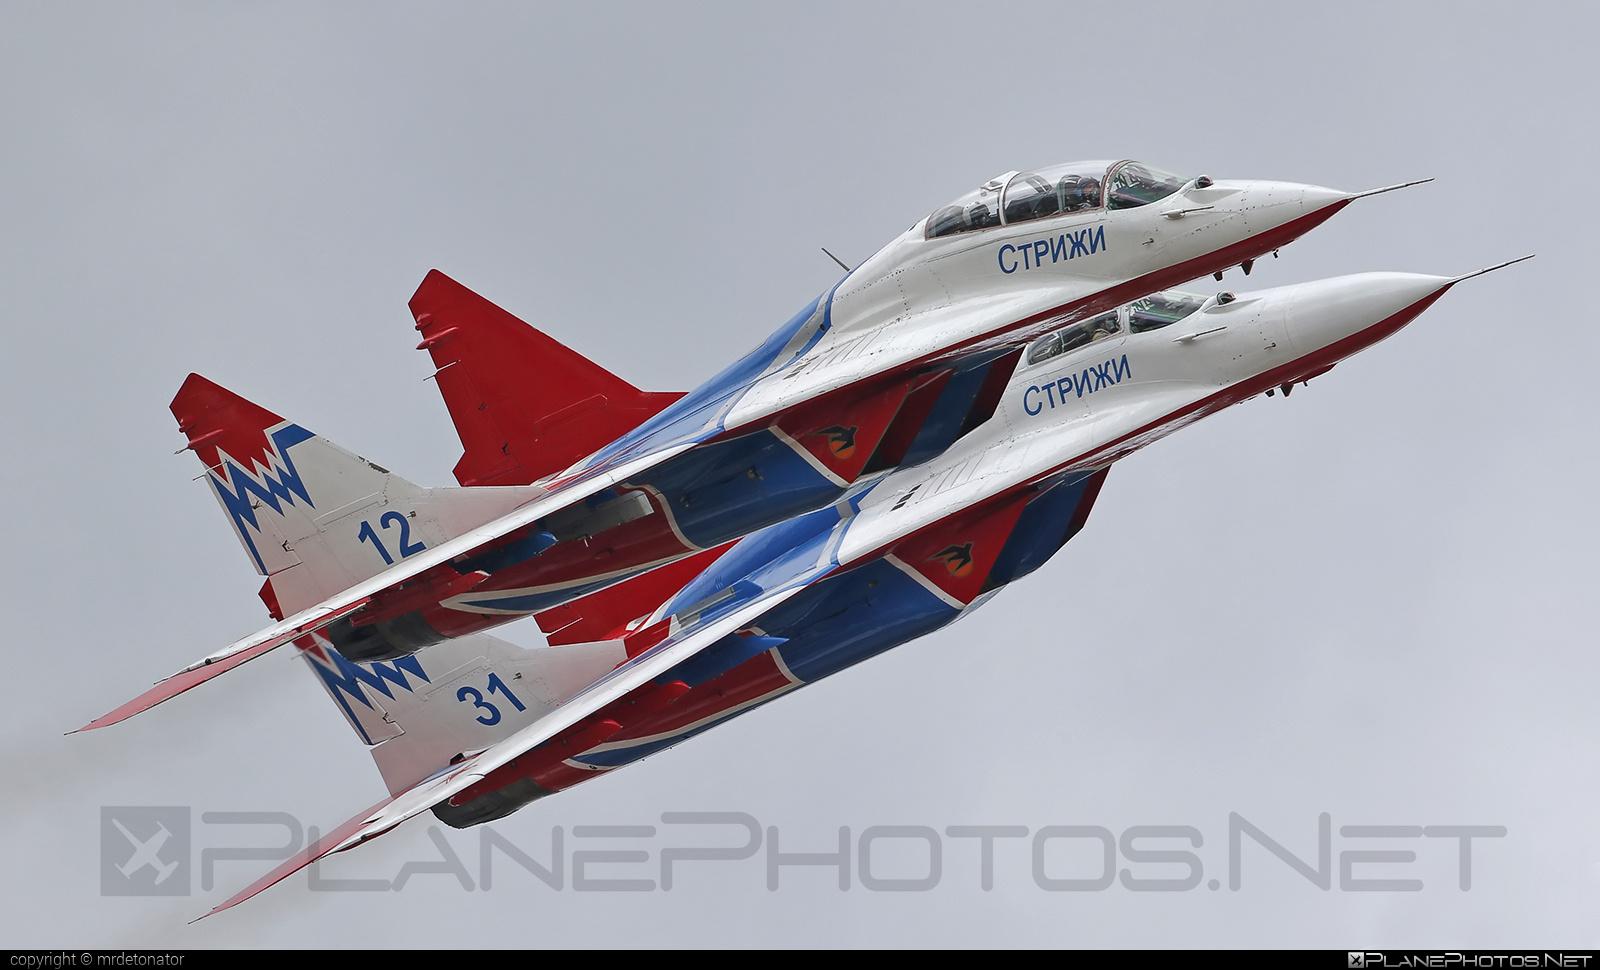 Mikoyan-Gurevich MiG-29UB - 12 operated by Voyenno-vozdushnye sily Rossii (Russian Air Force) #mig #mig29 #mig29ub #mikoyangurevich